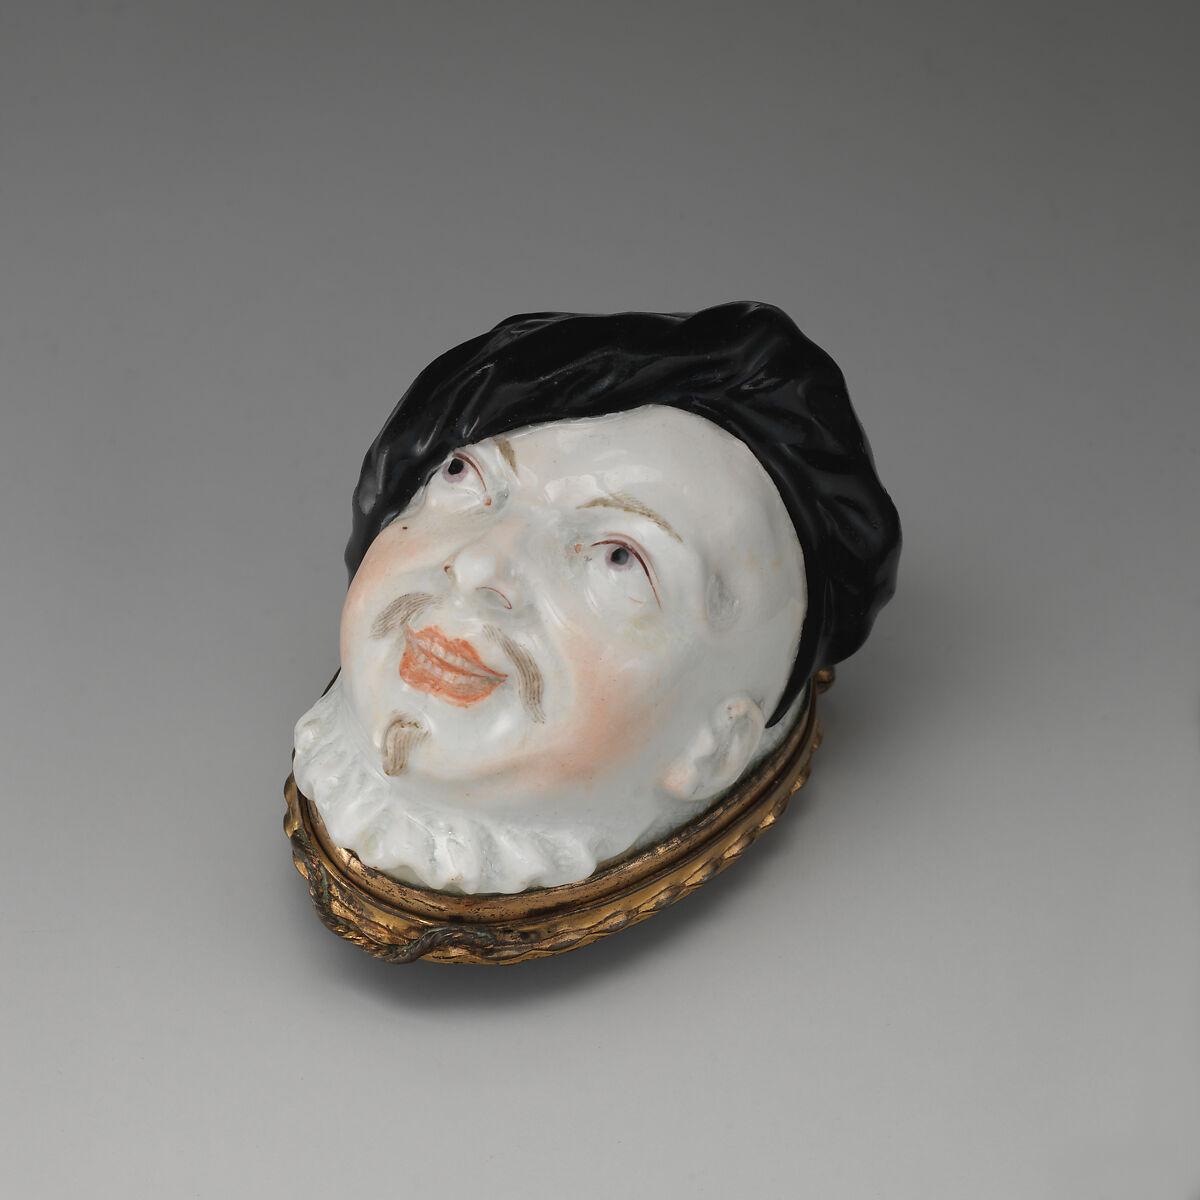 Chelsea Porcelain Manufactory | Man's head | British, Chelsea | The Met